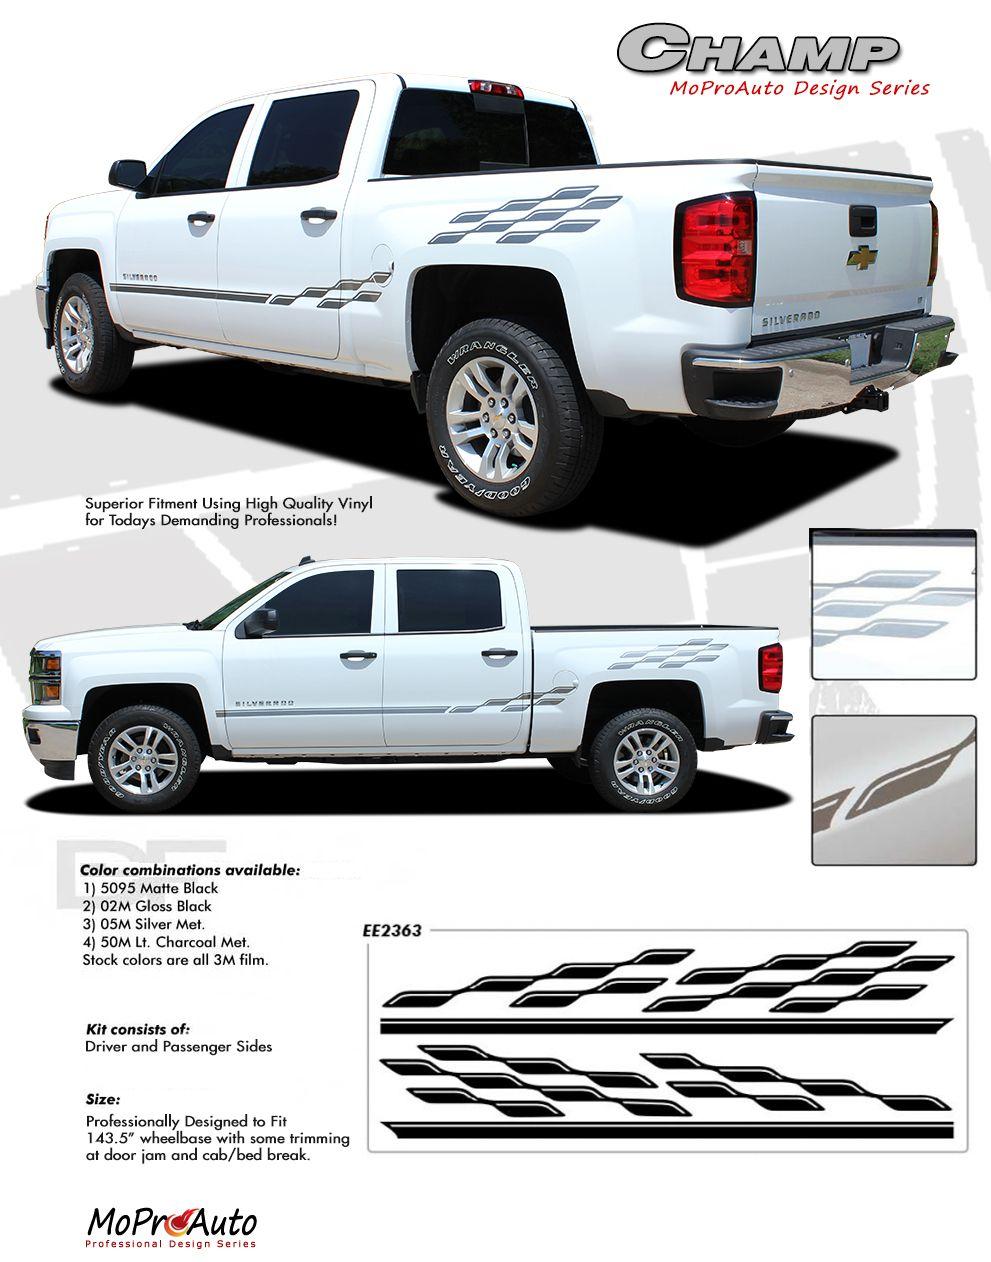 TRACK XL Chevy Silverado Or GMC Sierra Vinyl Graphic - Decals for trucks customizedcustom graphics decals honda chevy ford gmc mitsubishi